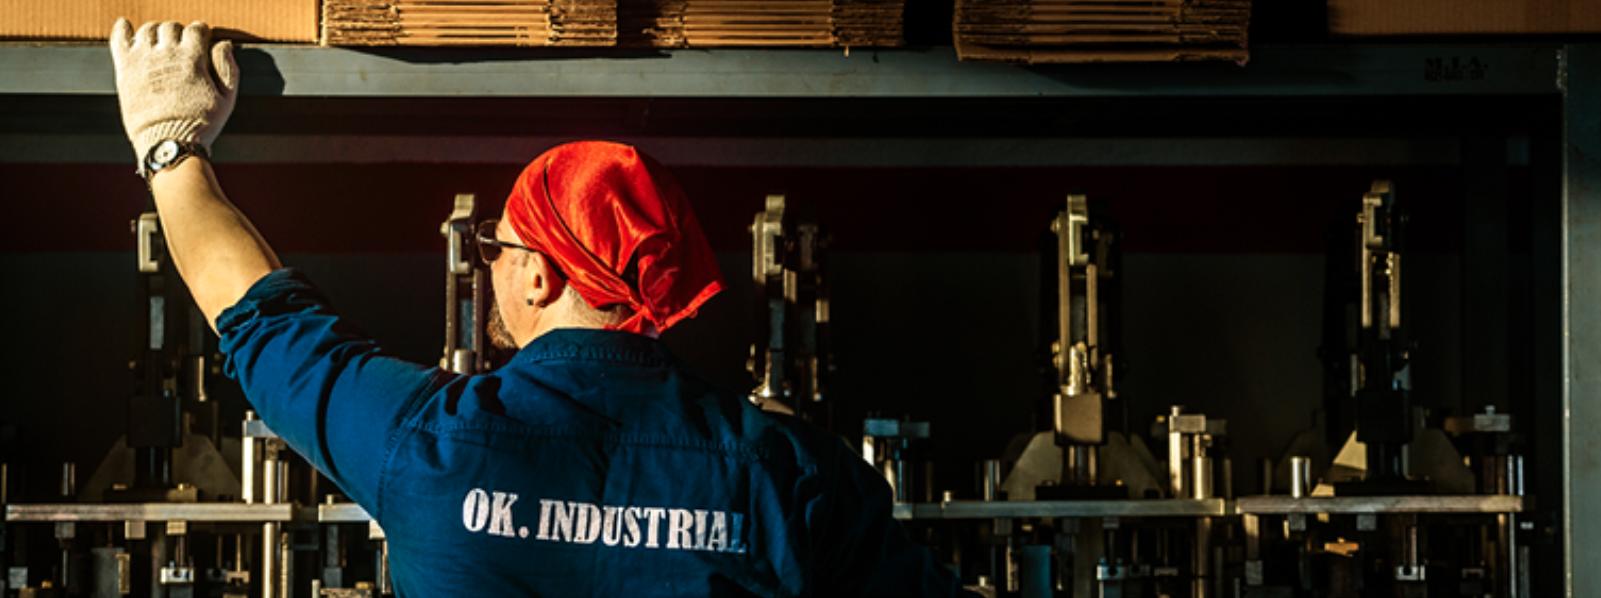 OK Industrial